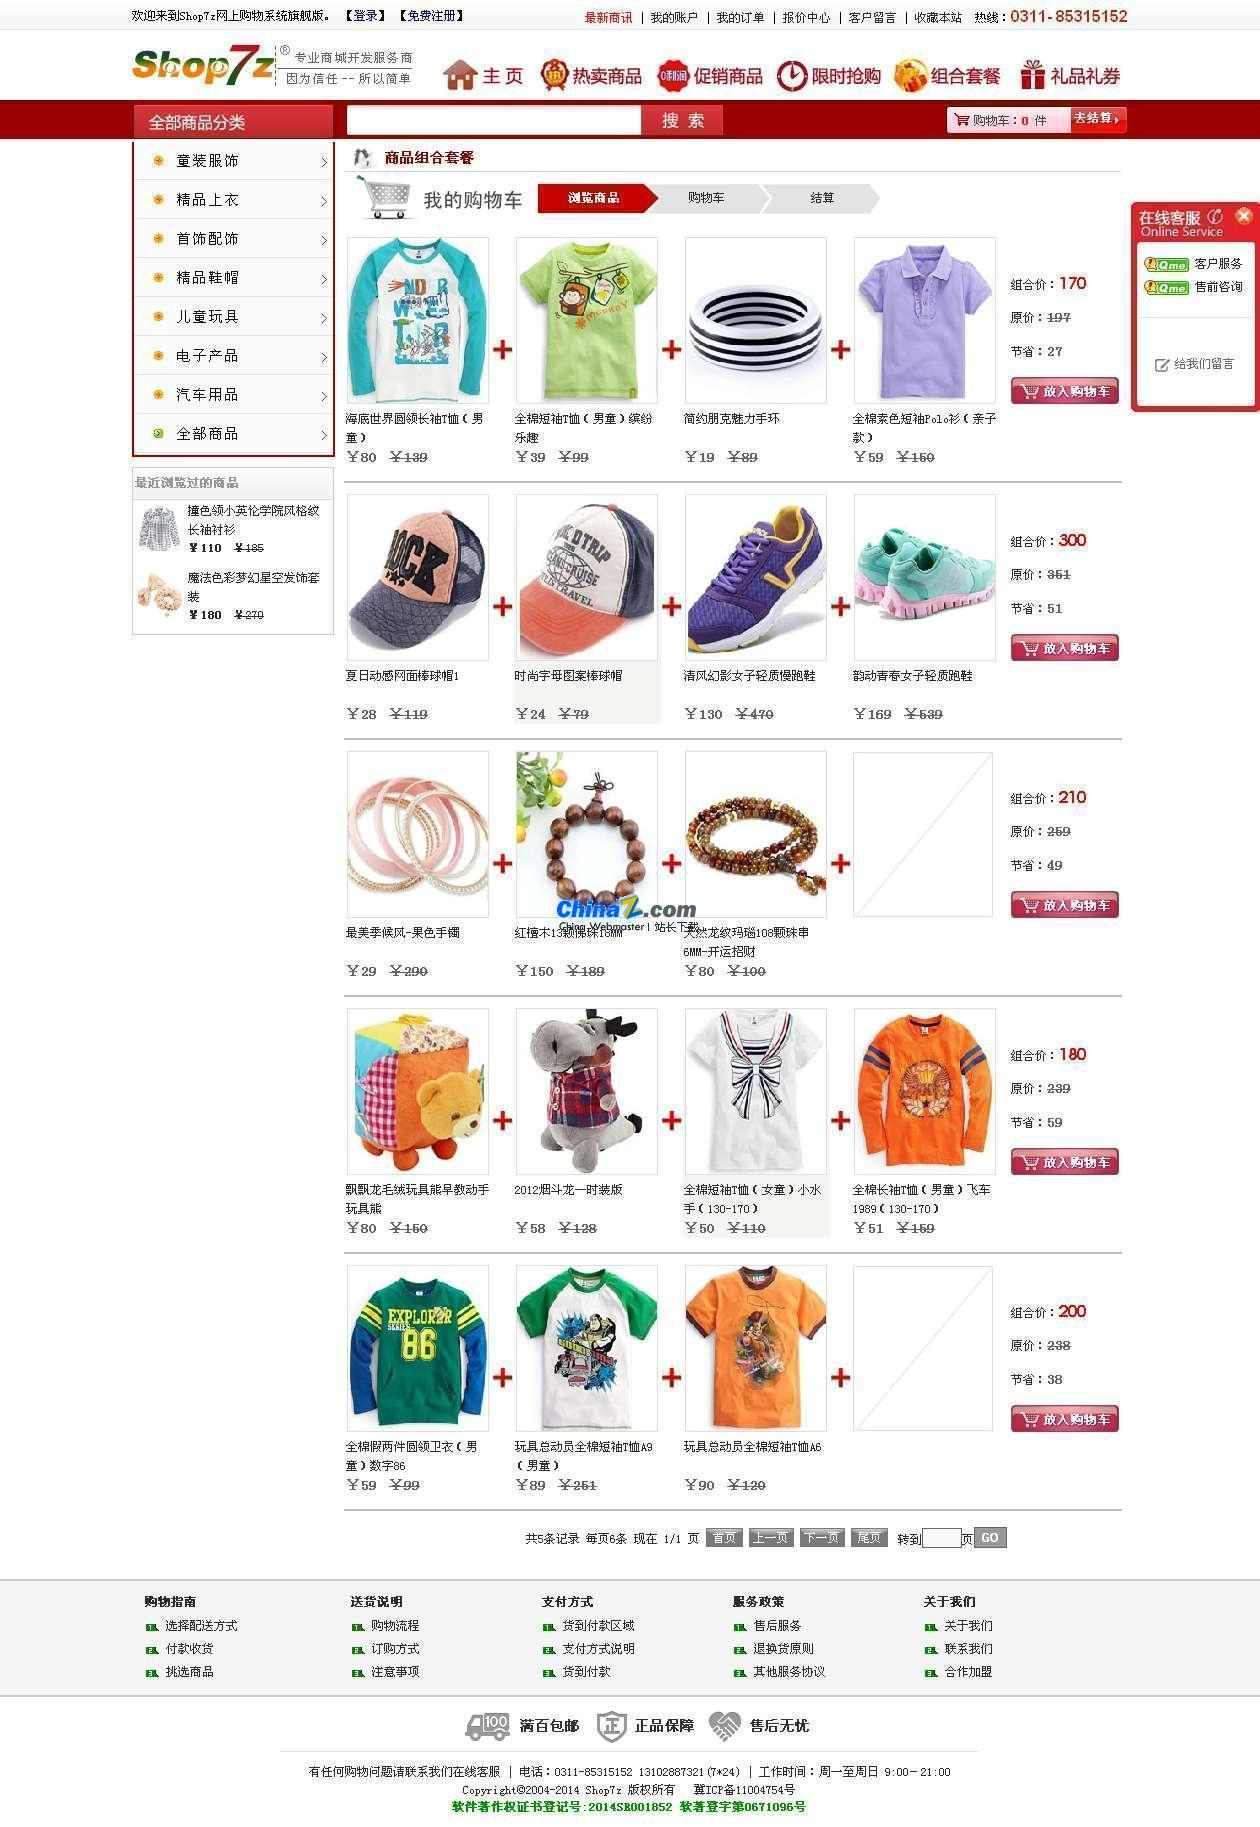 Shop7z网上购物系统